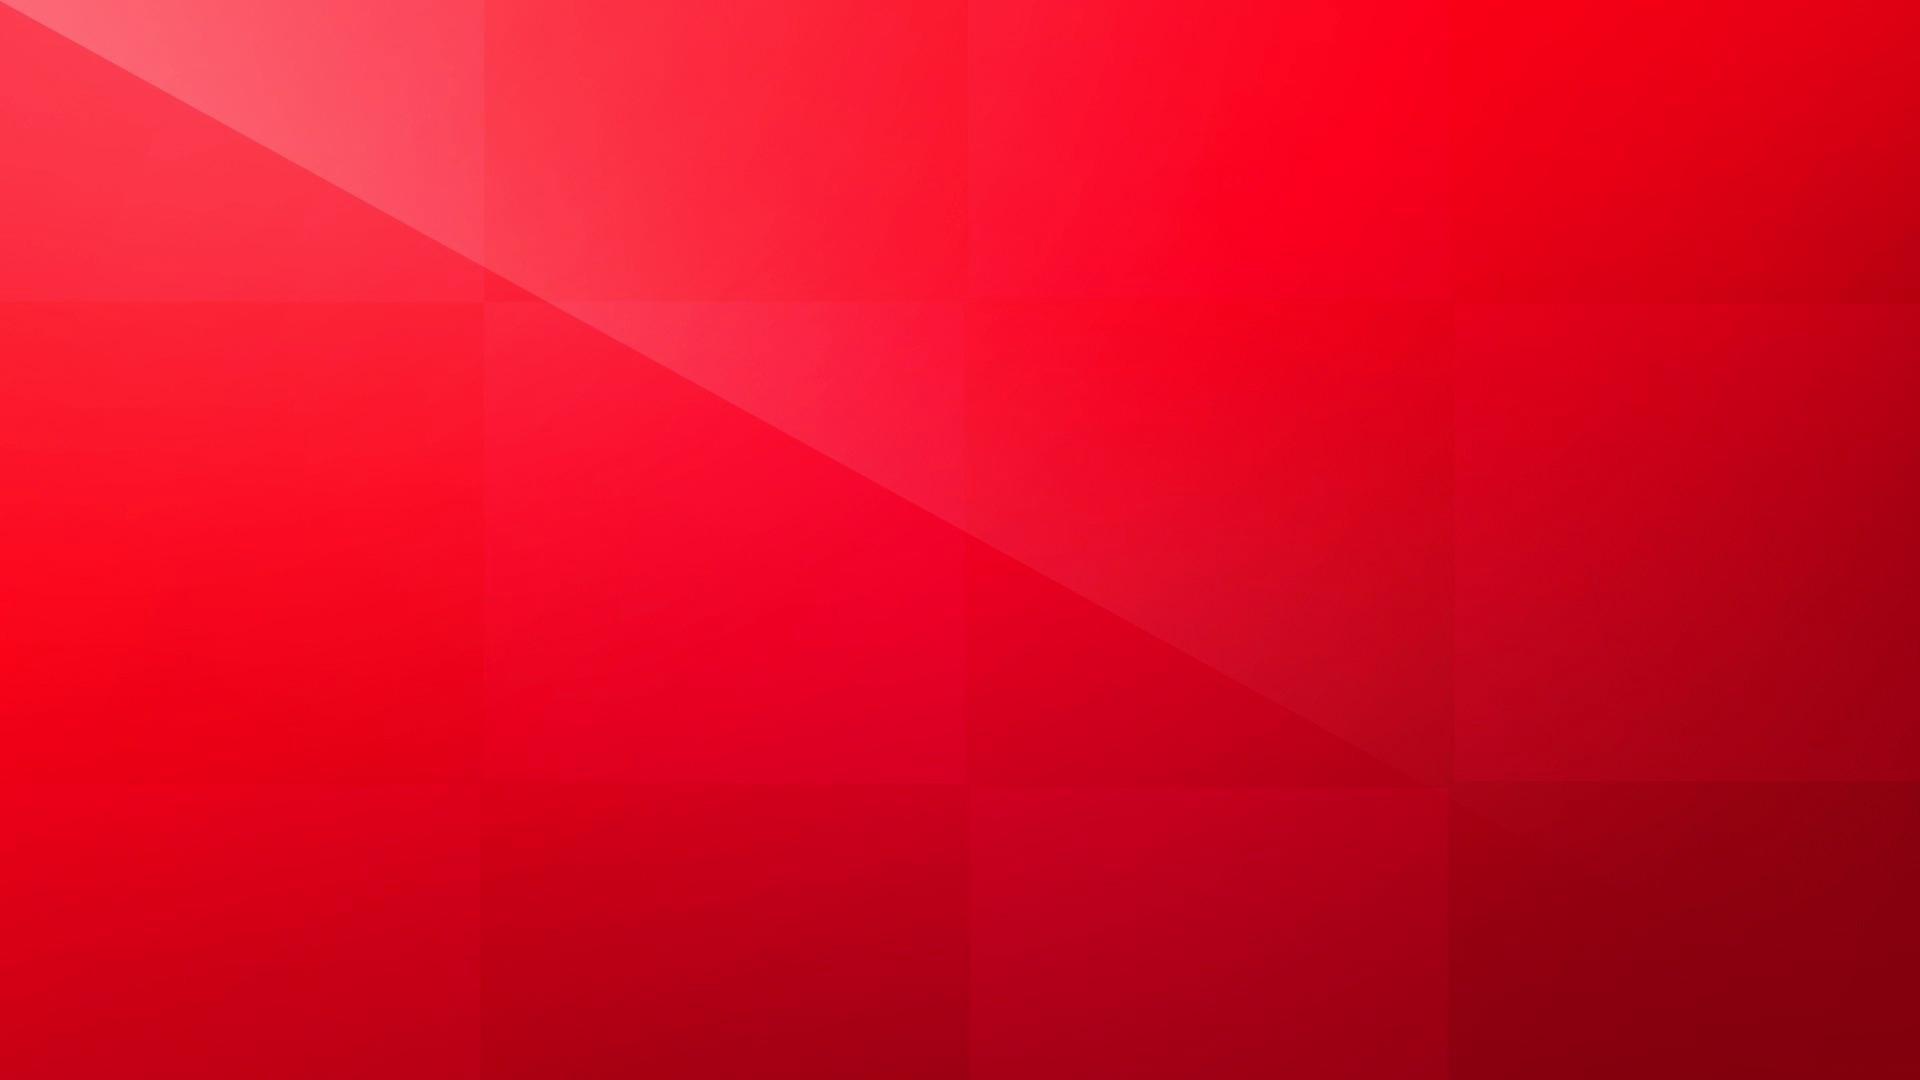 Desktop-Free-HD-Solid-Color-Wallpaper